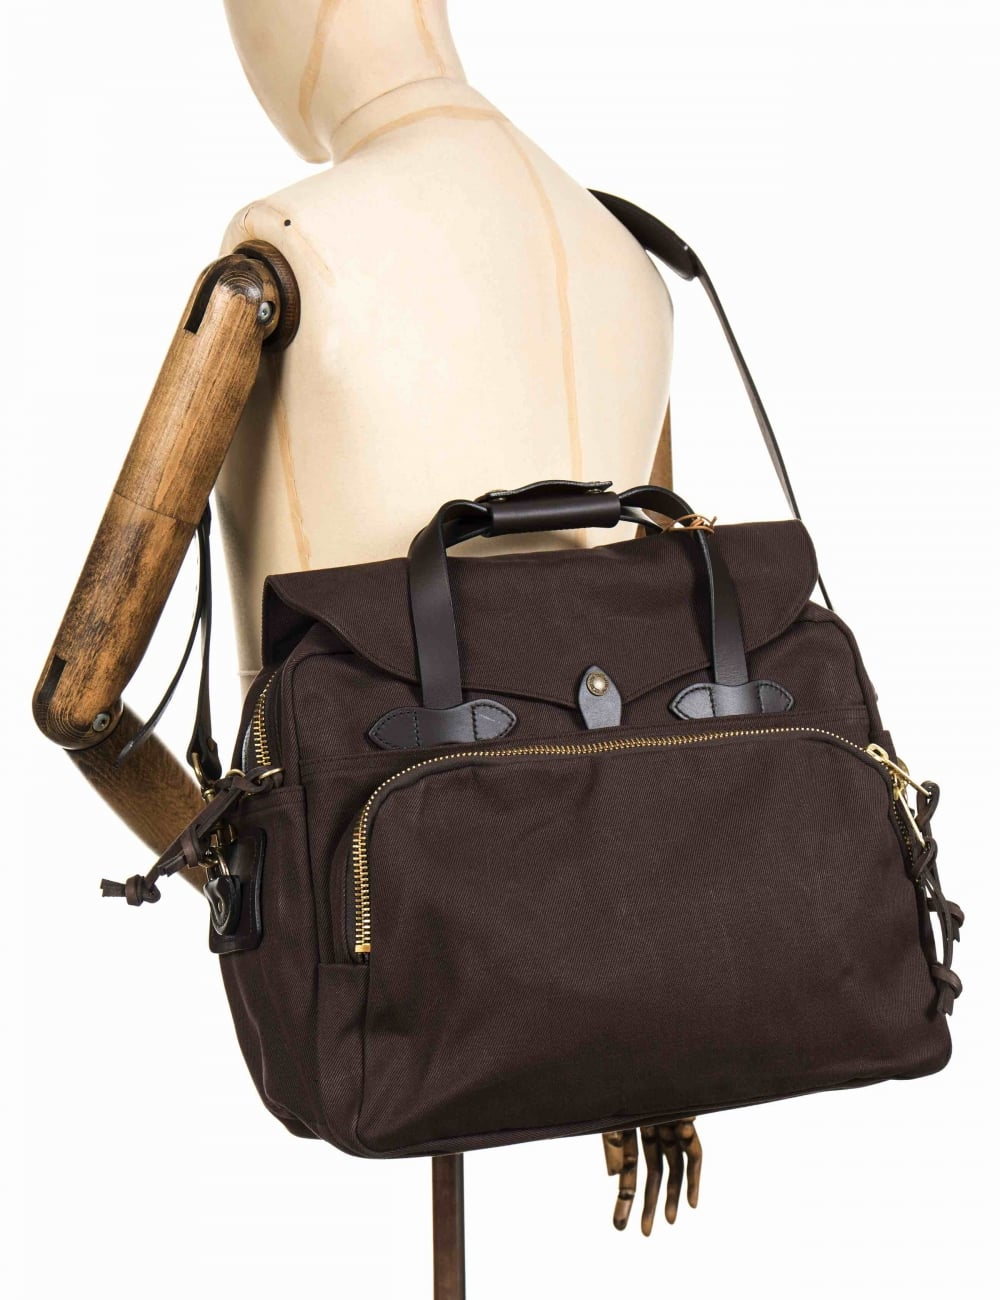 3bb0c339de17 Padded Computer Bag - Brown